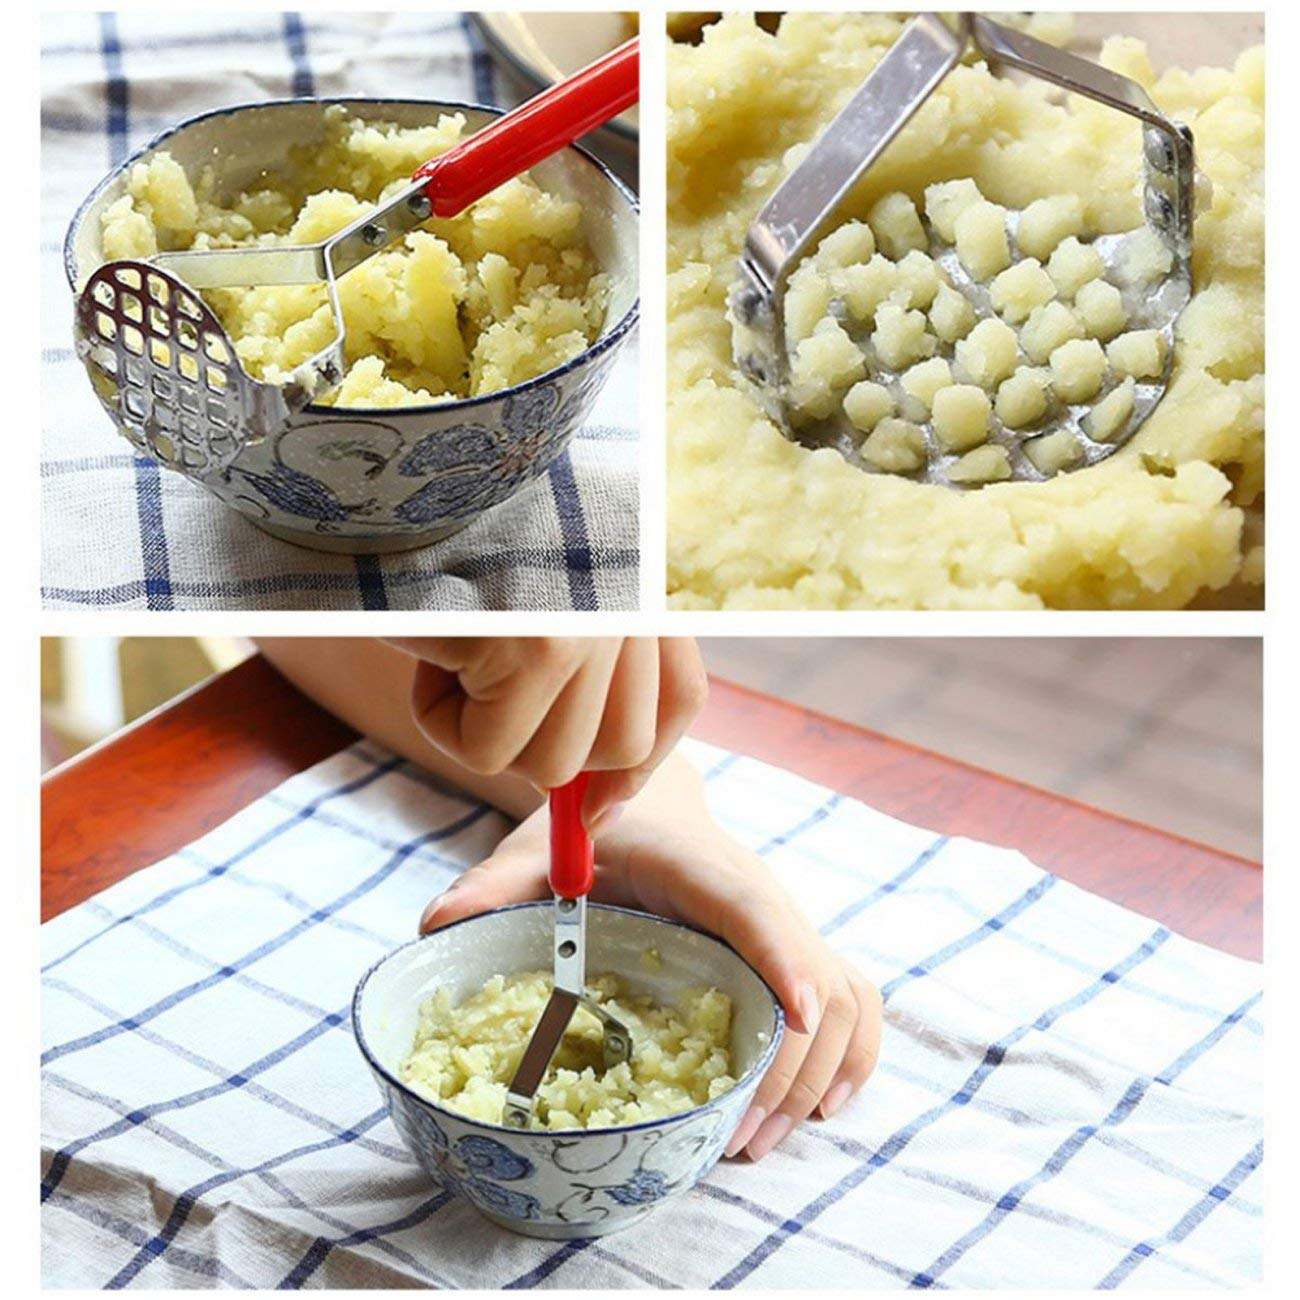 Elviray Stainless Steel Potato Fruit Sweet Potato Masher